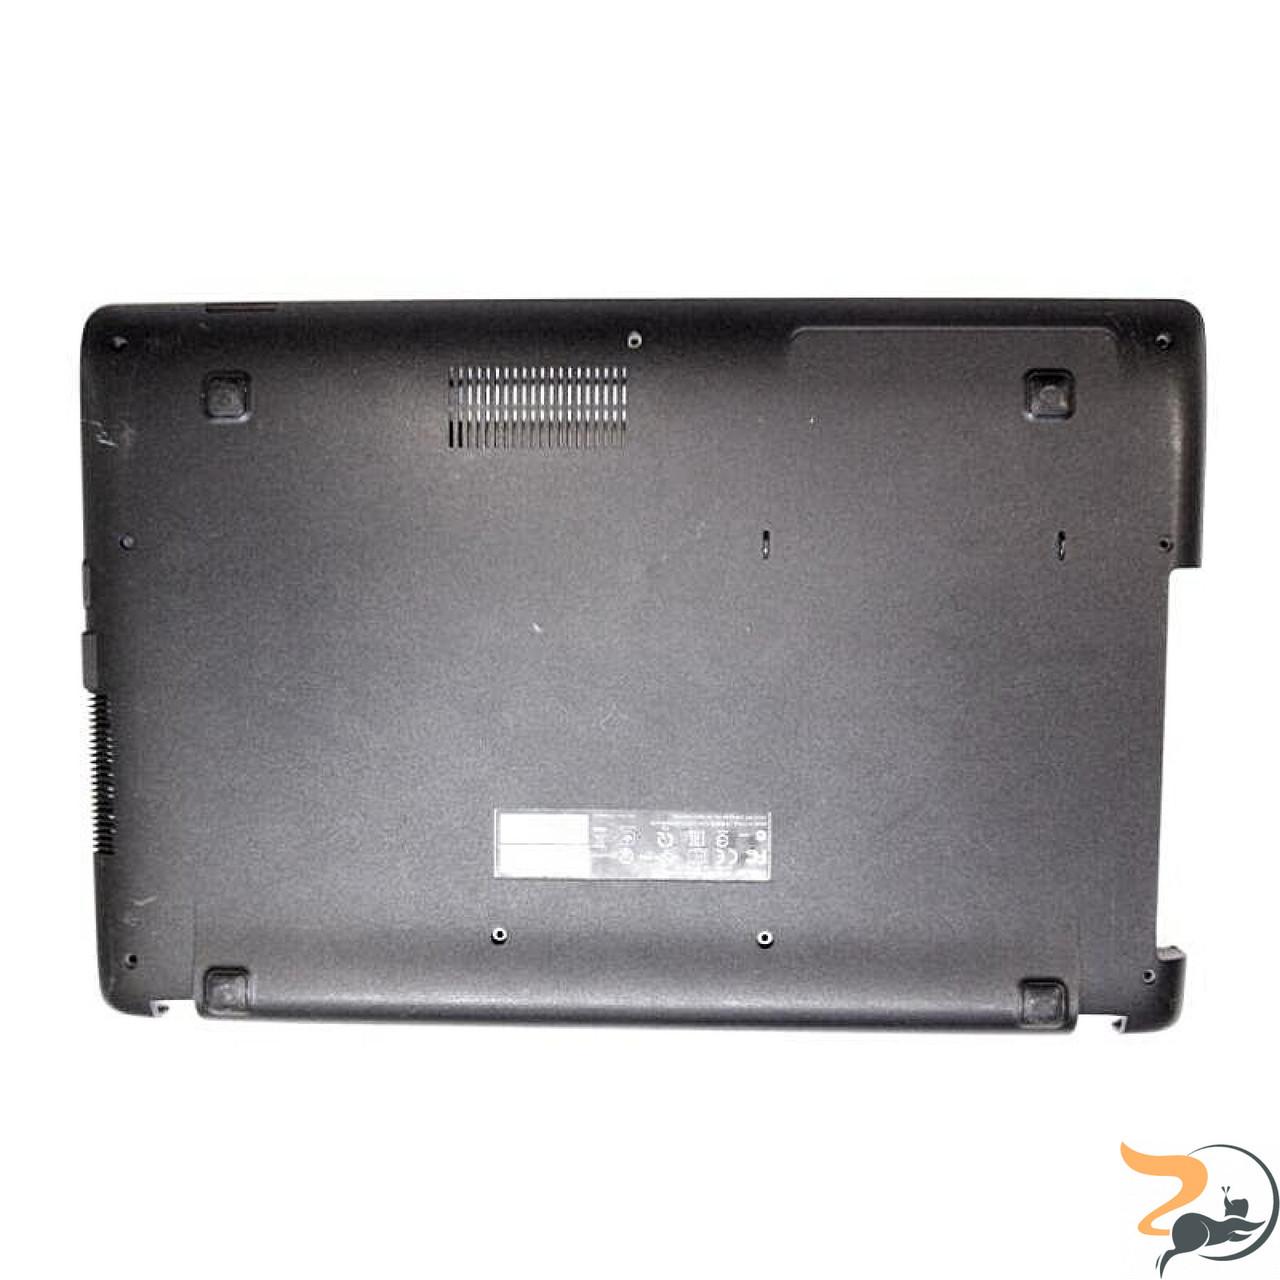 Нижня частина корпуса для ноутбука Asus X551, 13NB0341AP0431, Б/В.